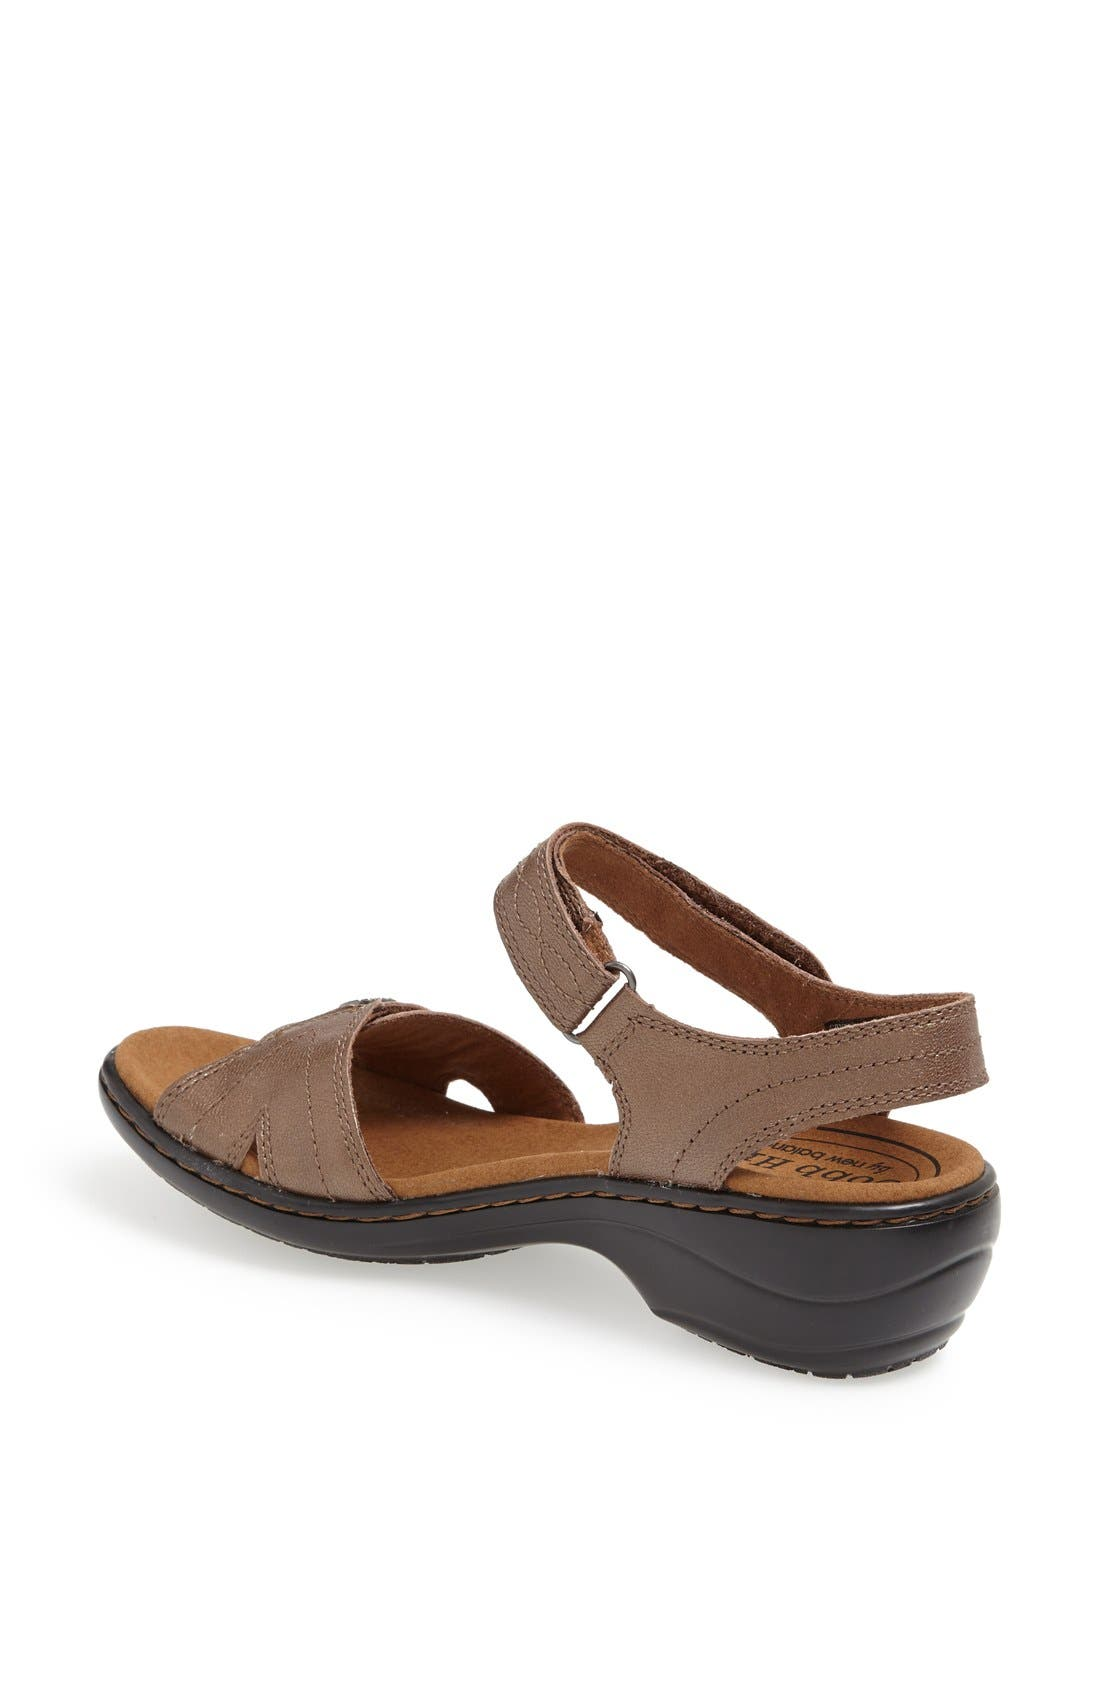 Alternate Image 2  - Cobb Hill 'Minx' Sandal